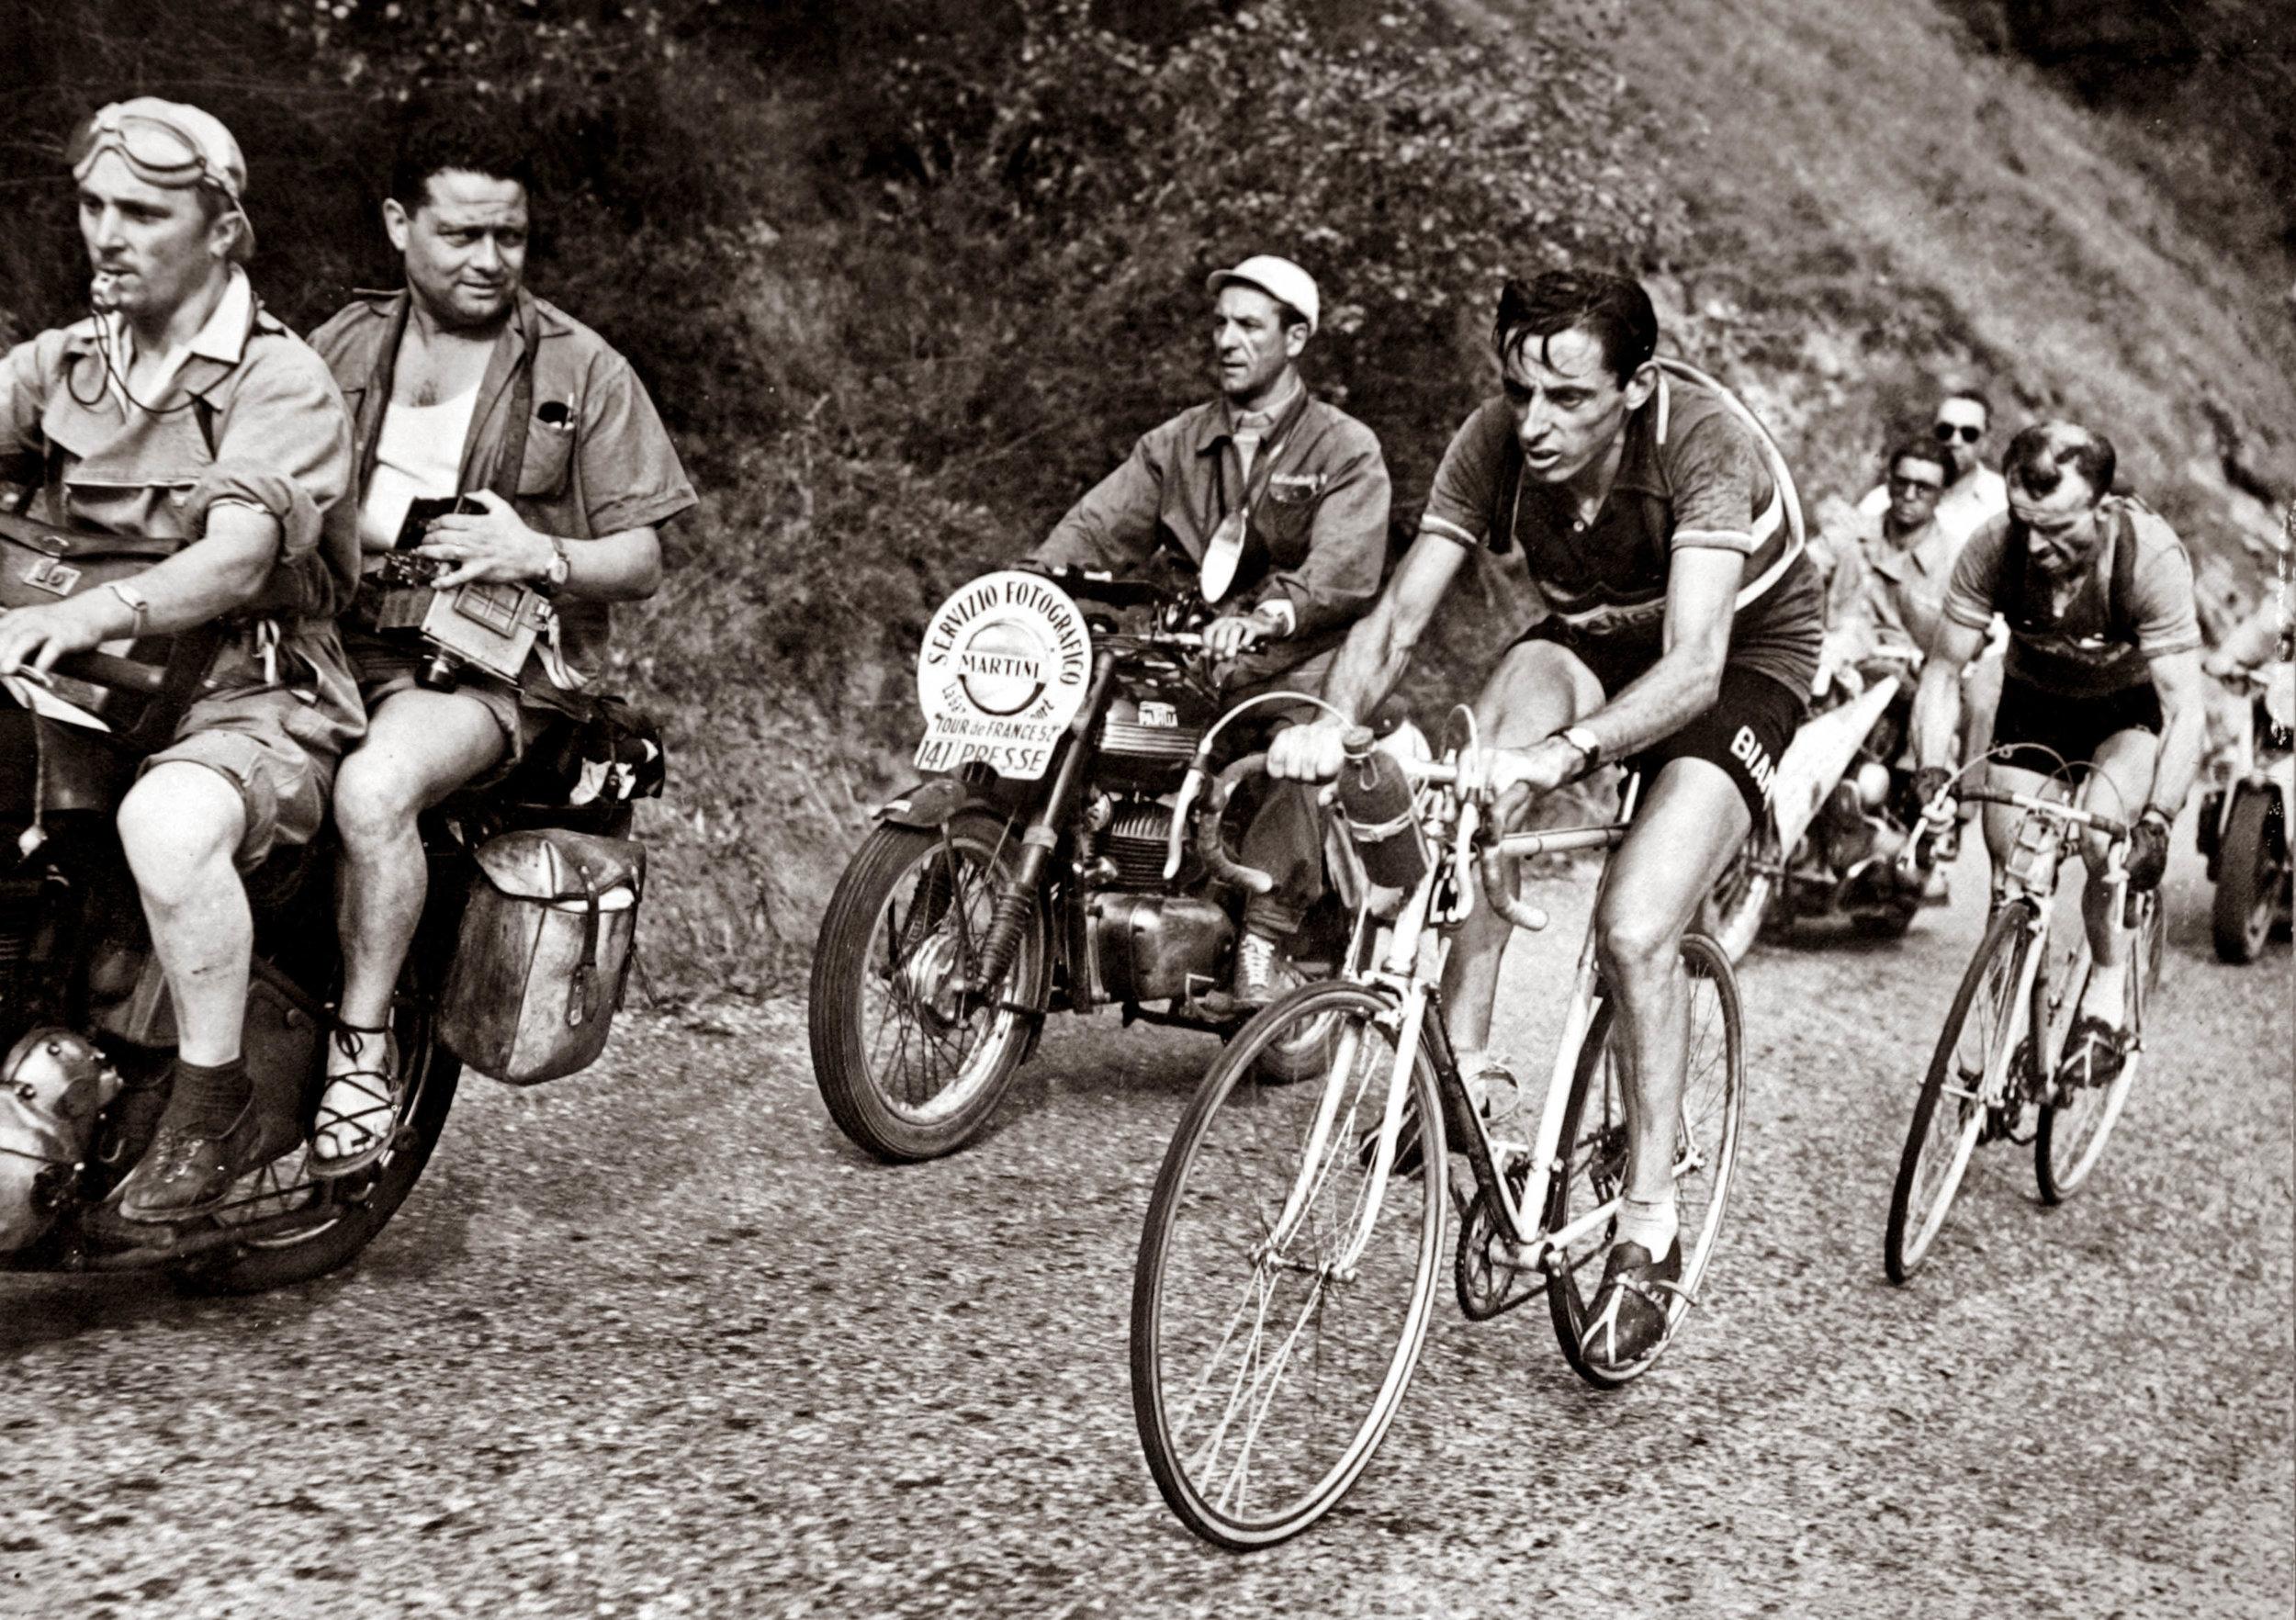 Fausto Coppi won five times